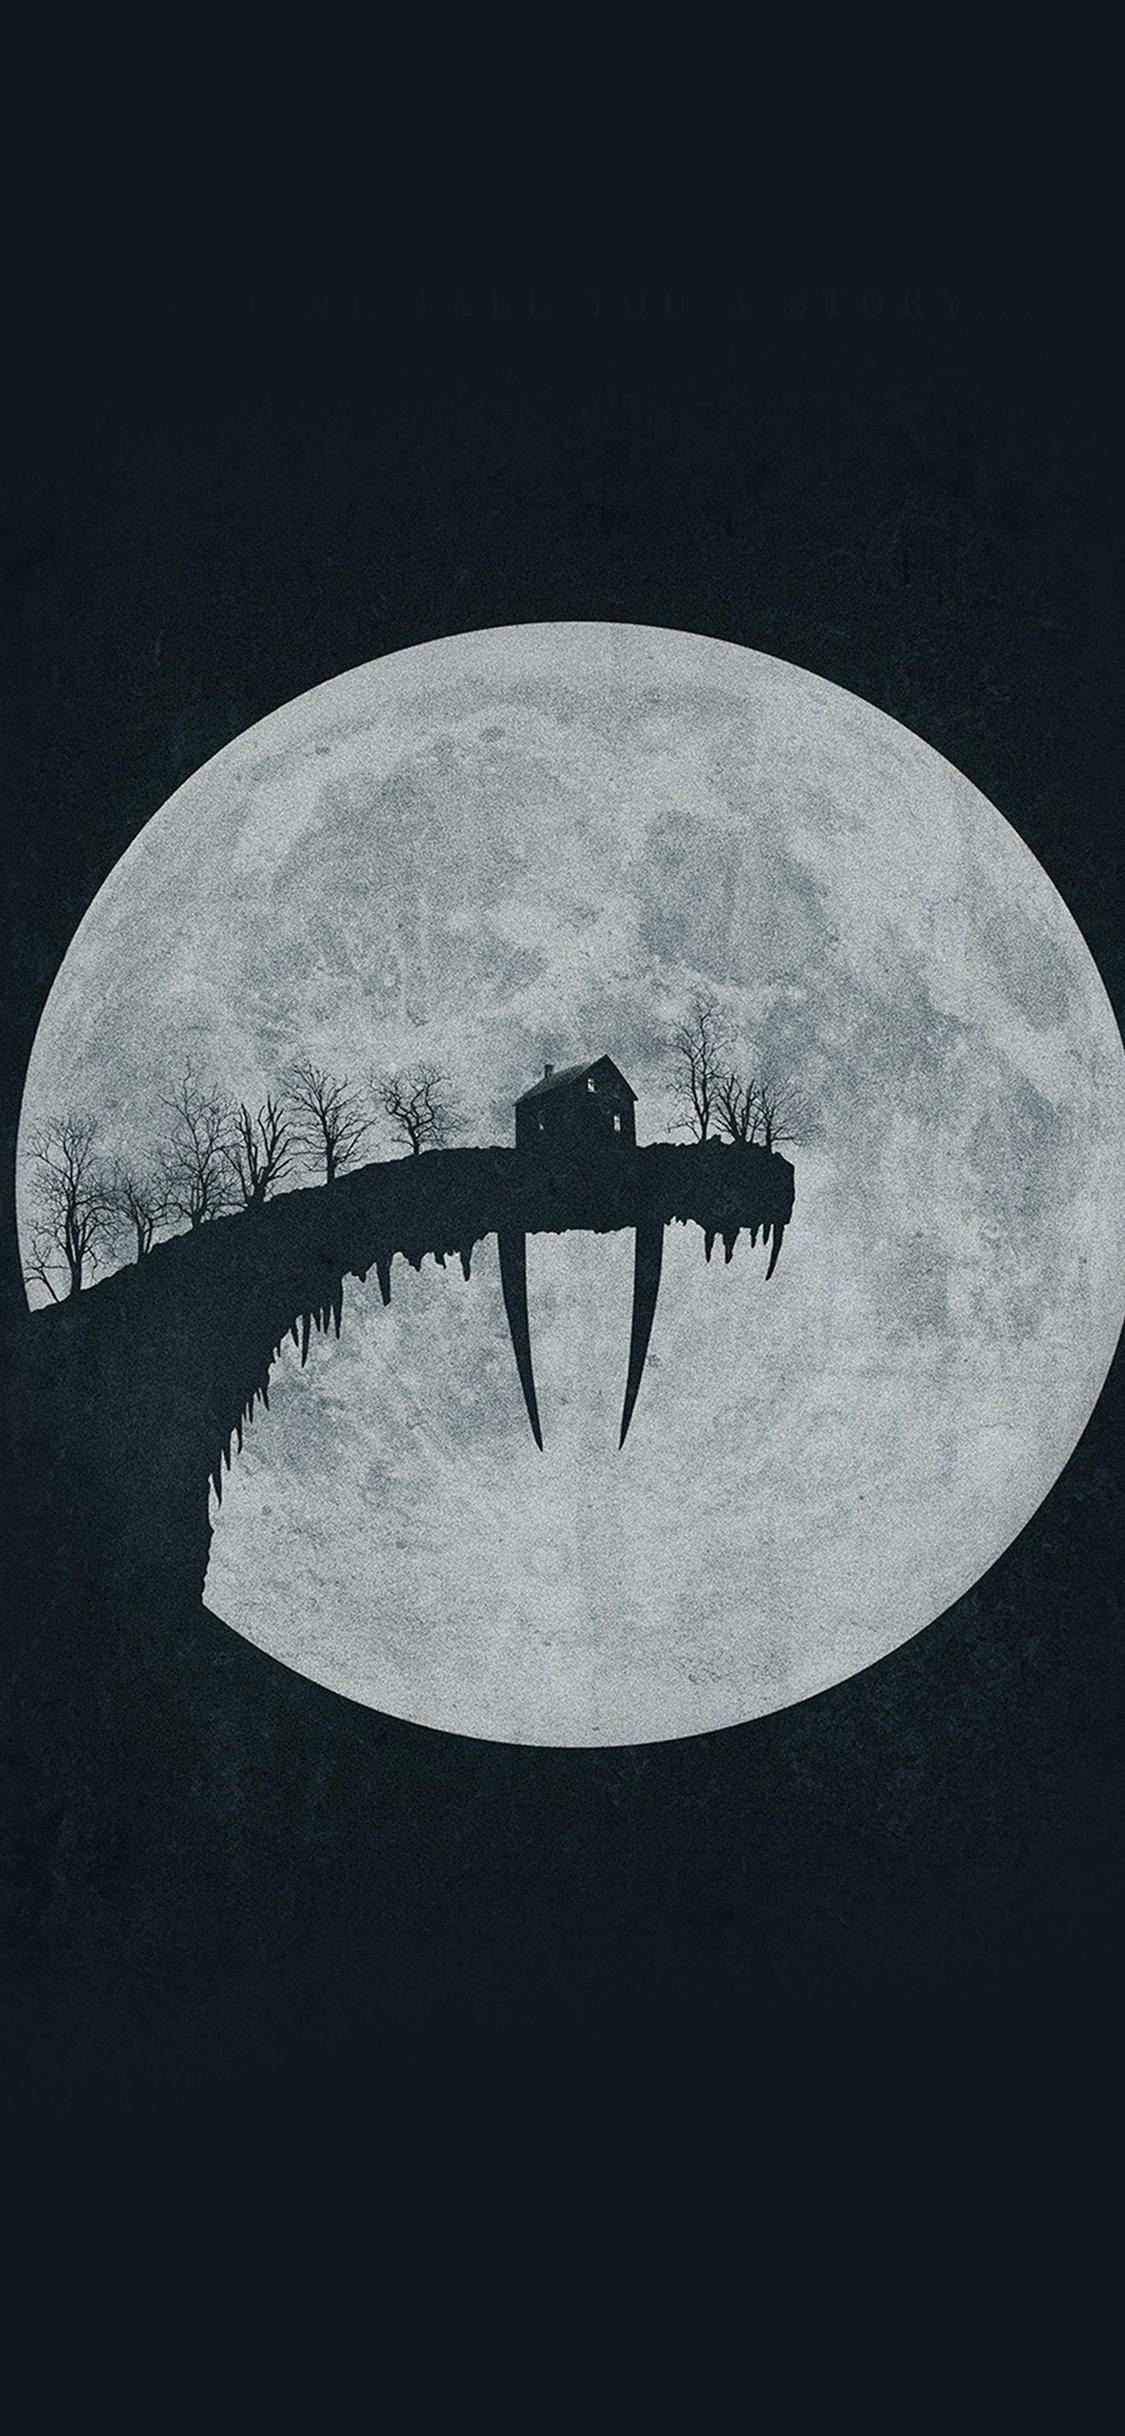 Tusk Moon Poster Illustration Art Dark iPhone X wallpaper